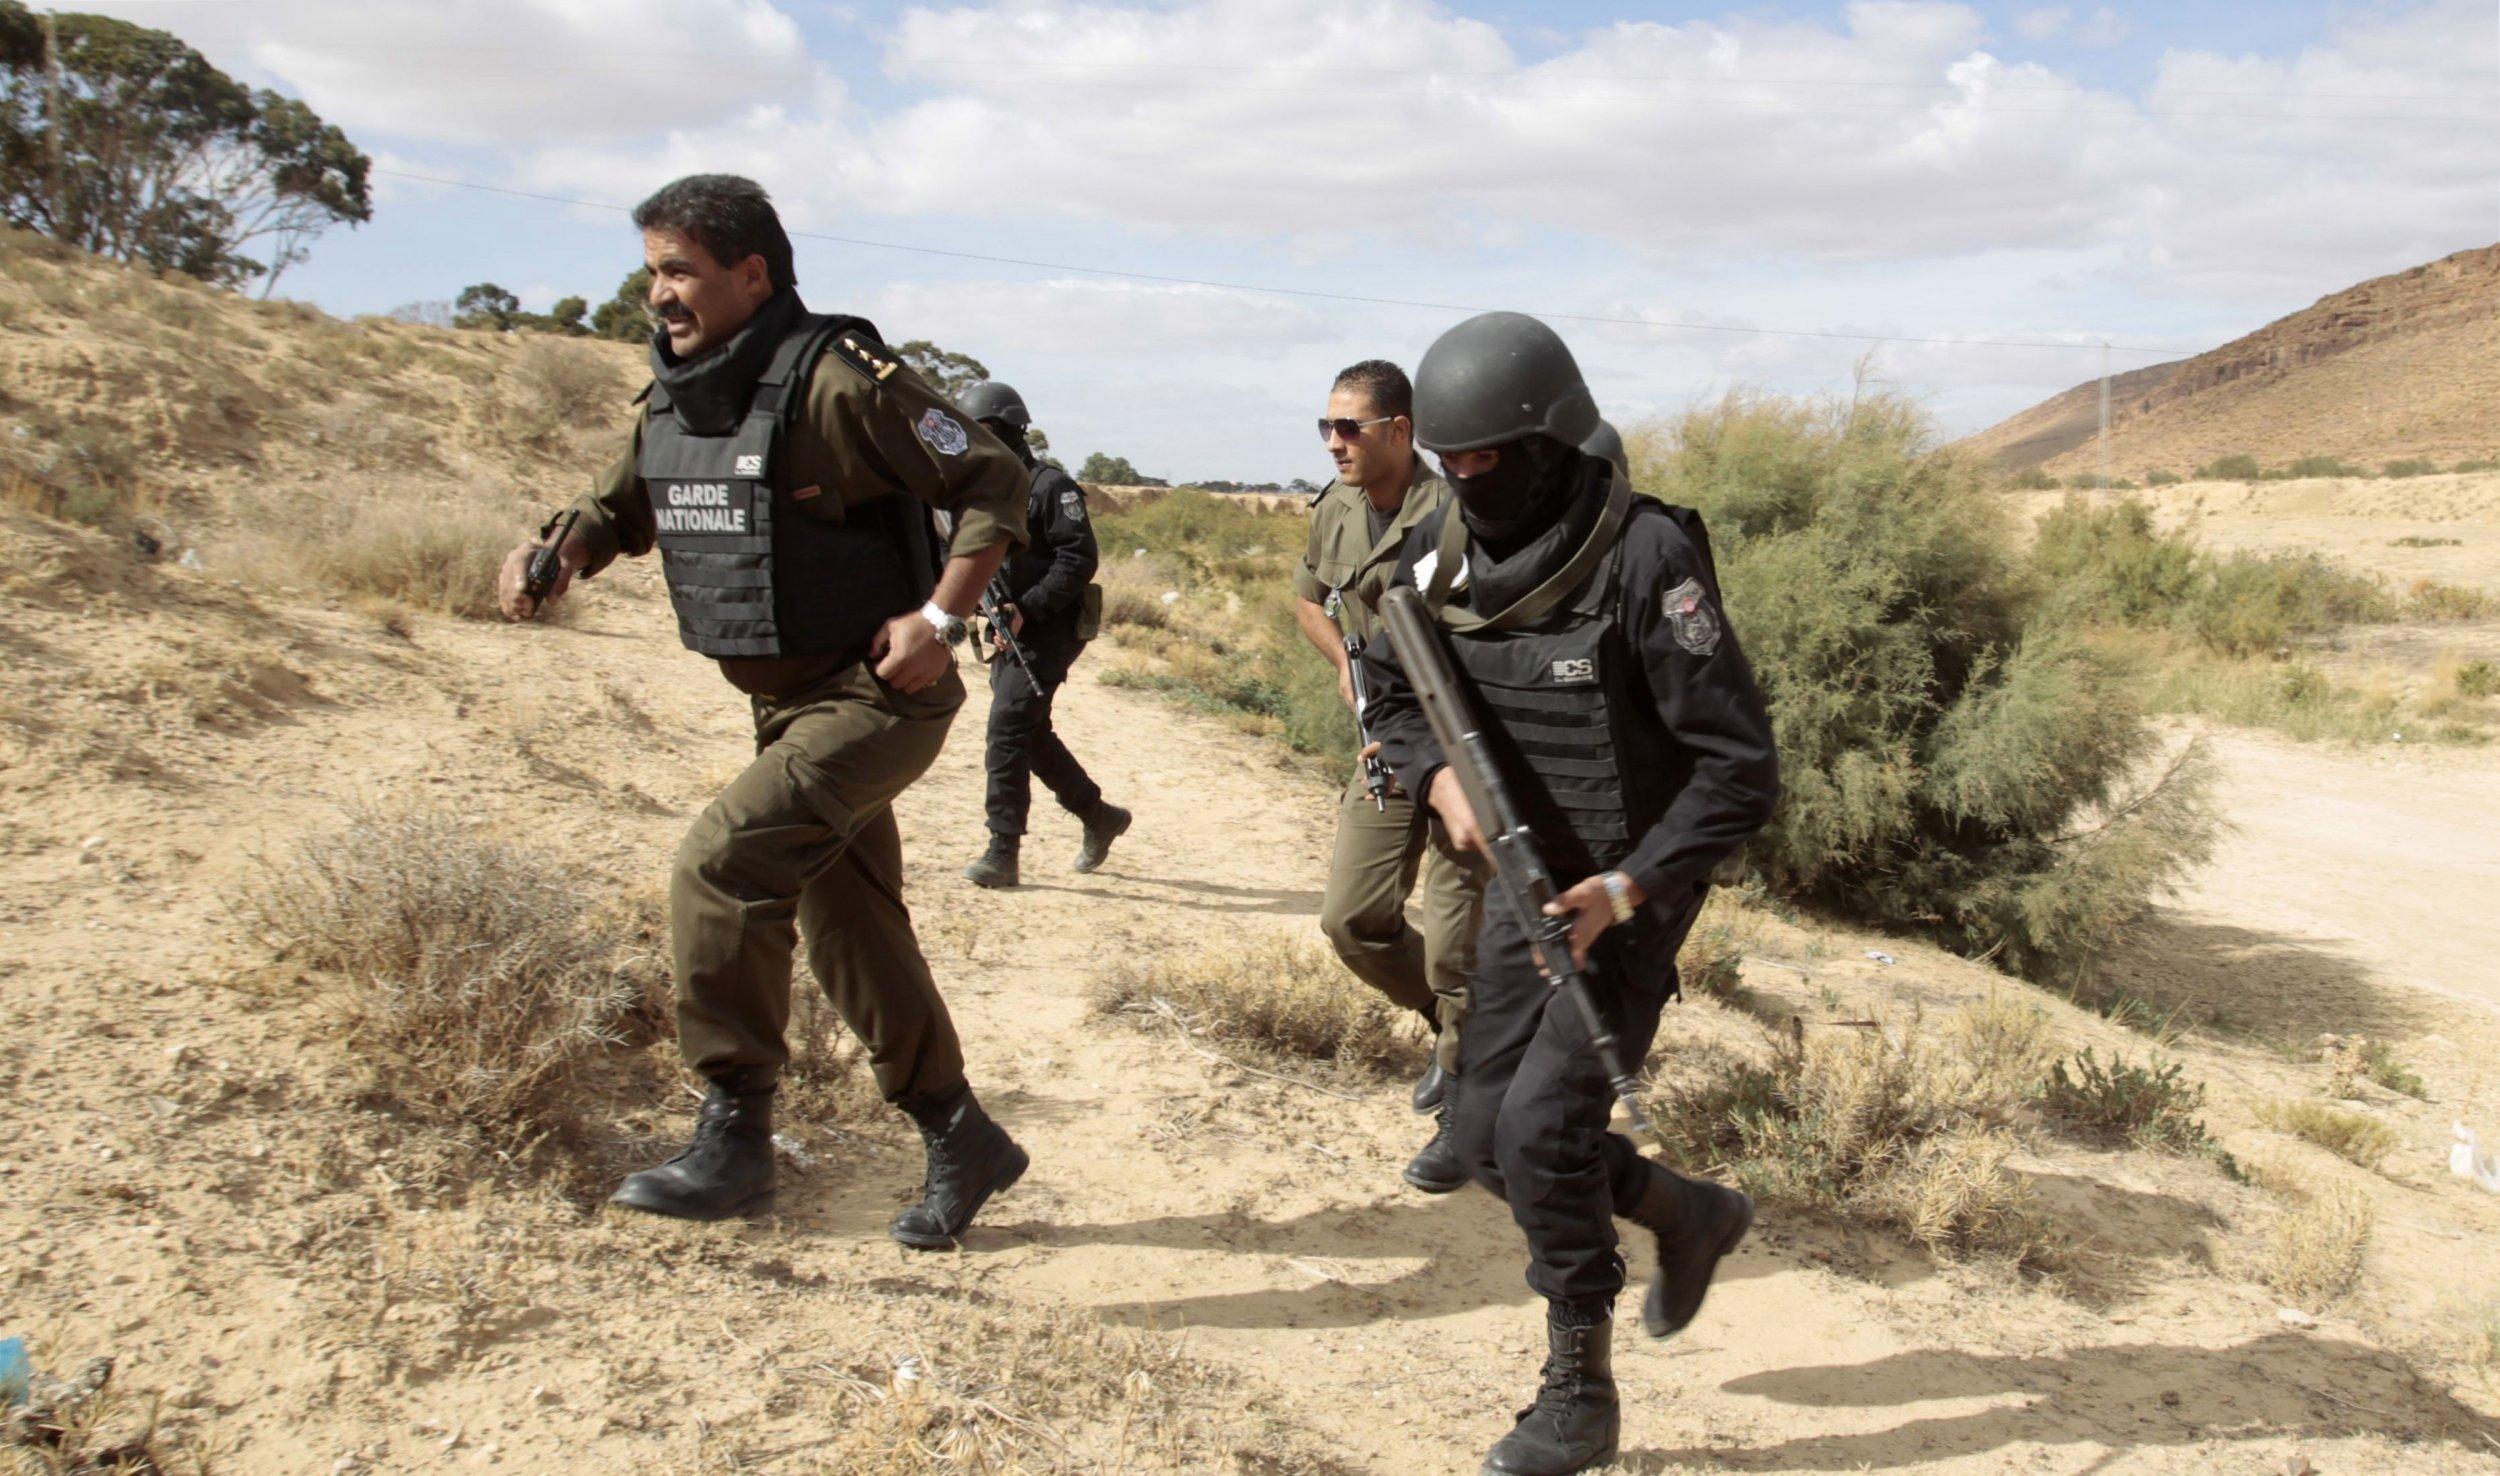 Tunisia Algeria Jebel Chaambi North Africa Al Qaeda Kasserine Tunis